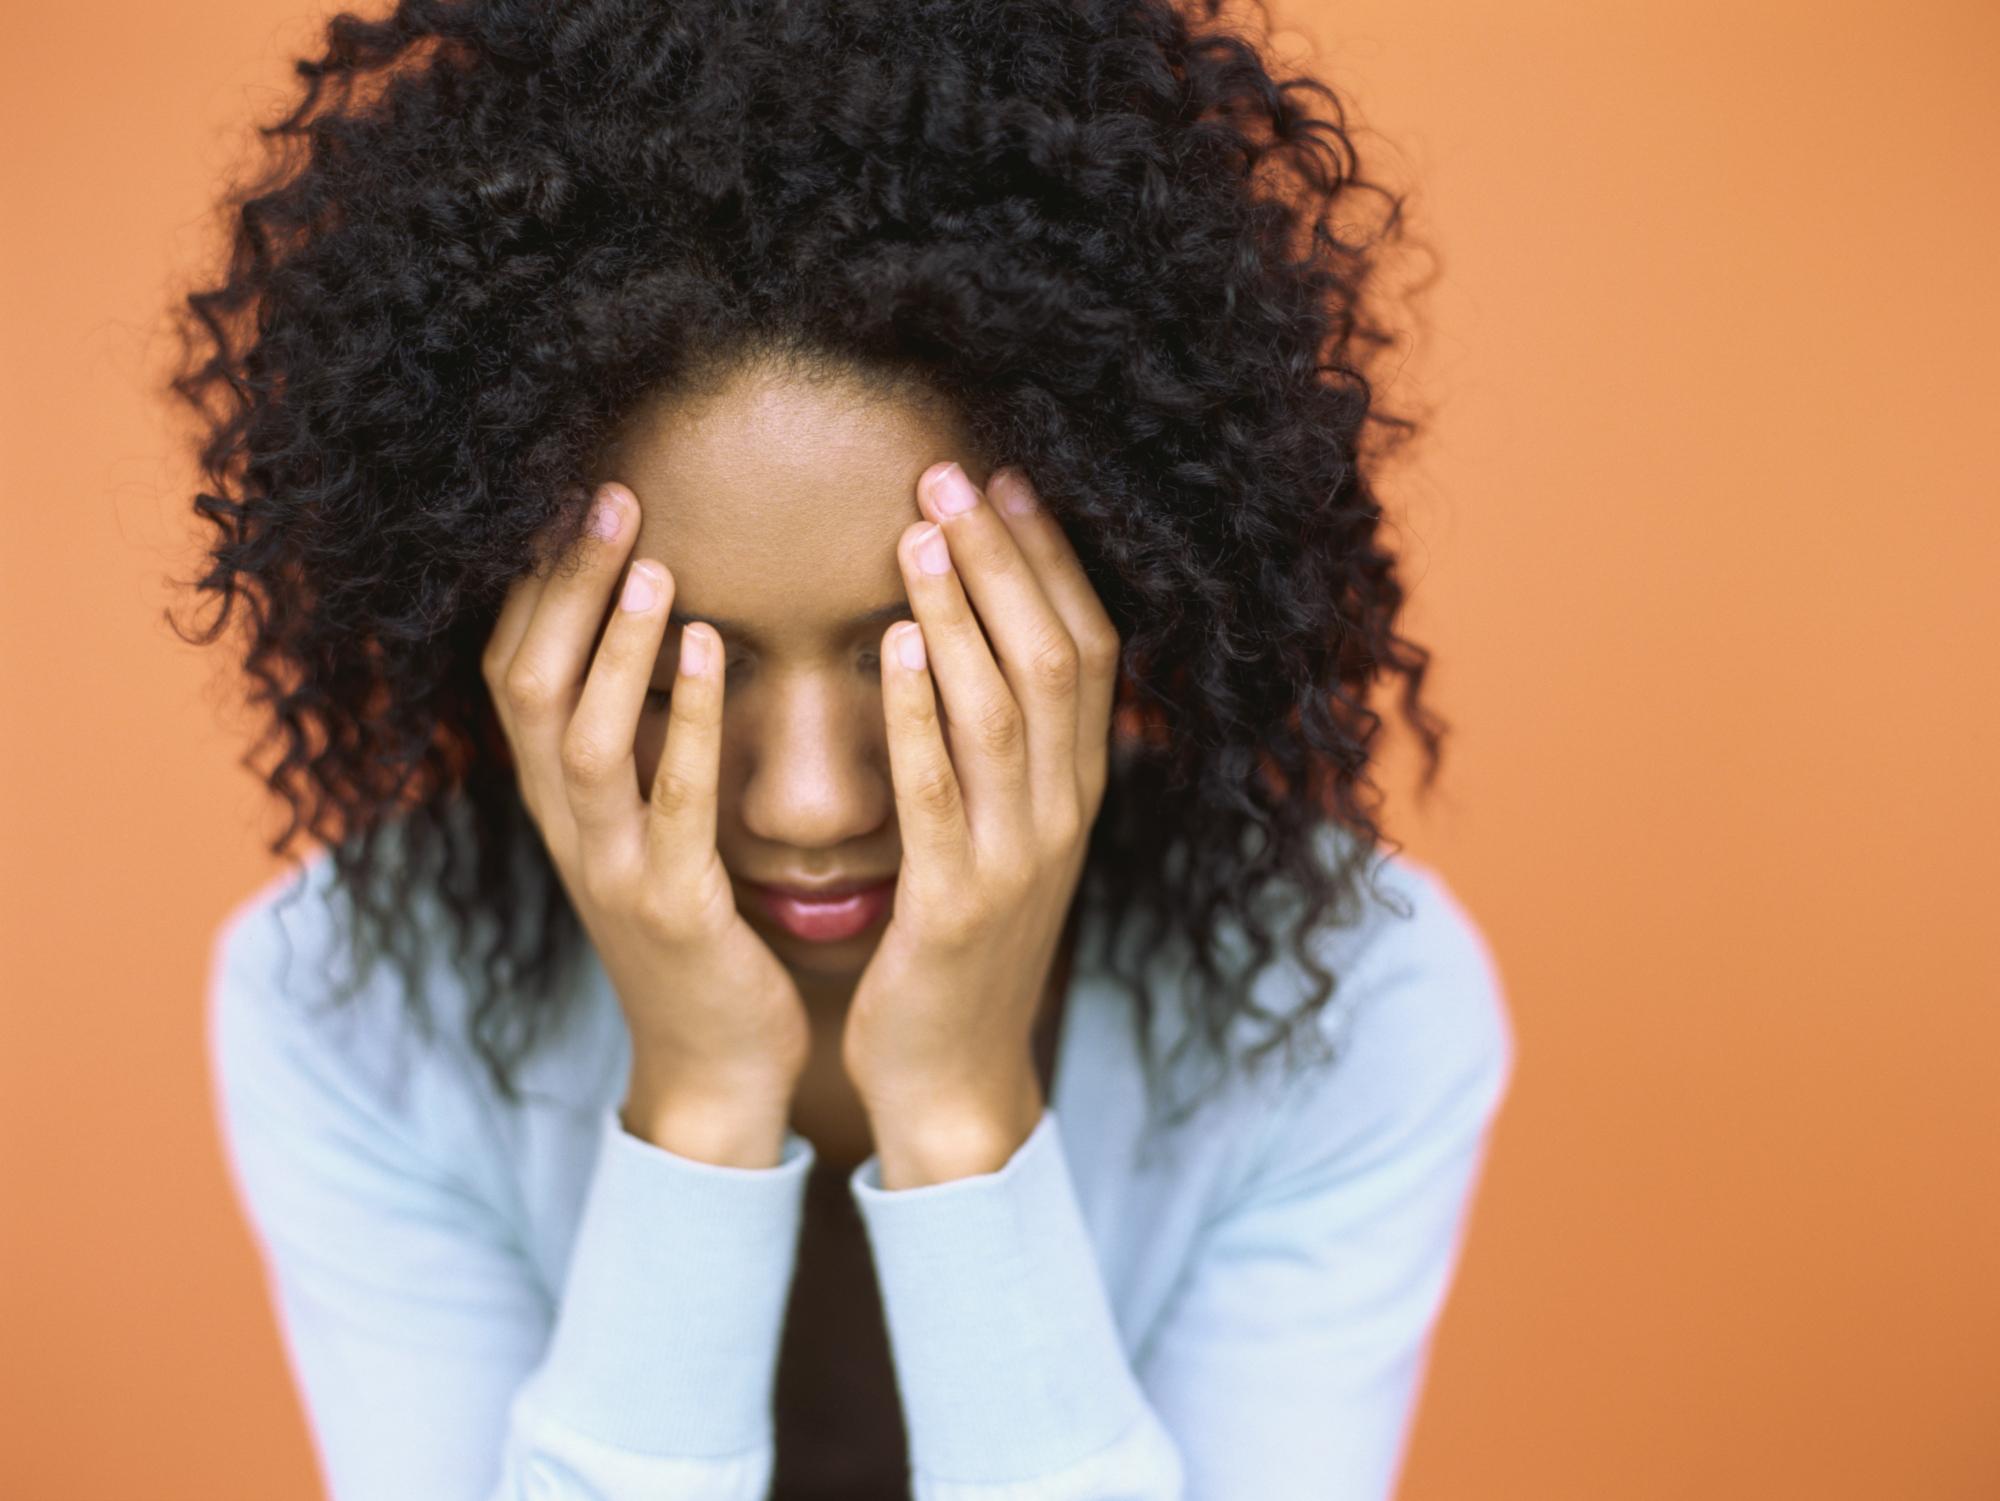 Trauma and Guidance for a Trauma-Informed Approach (2CE)